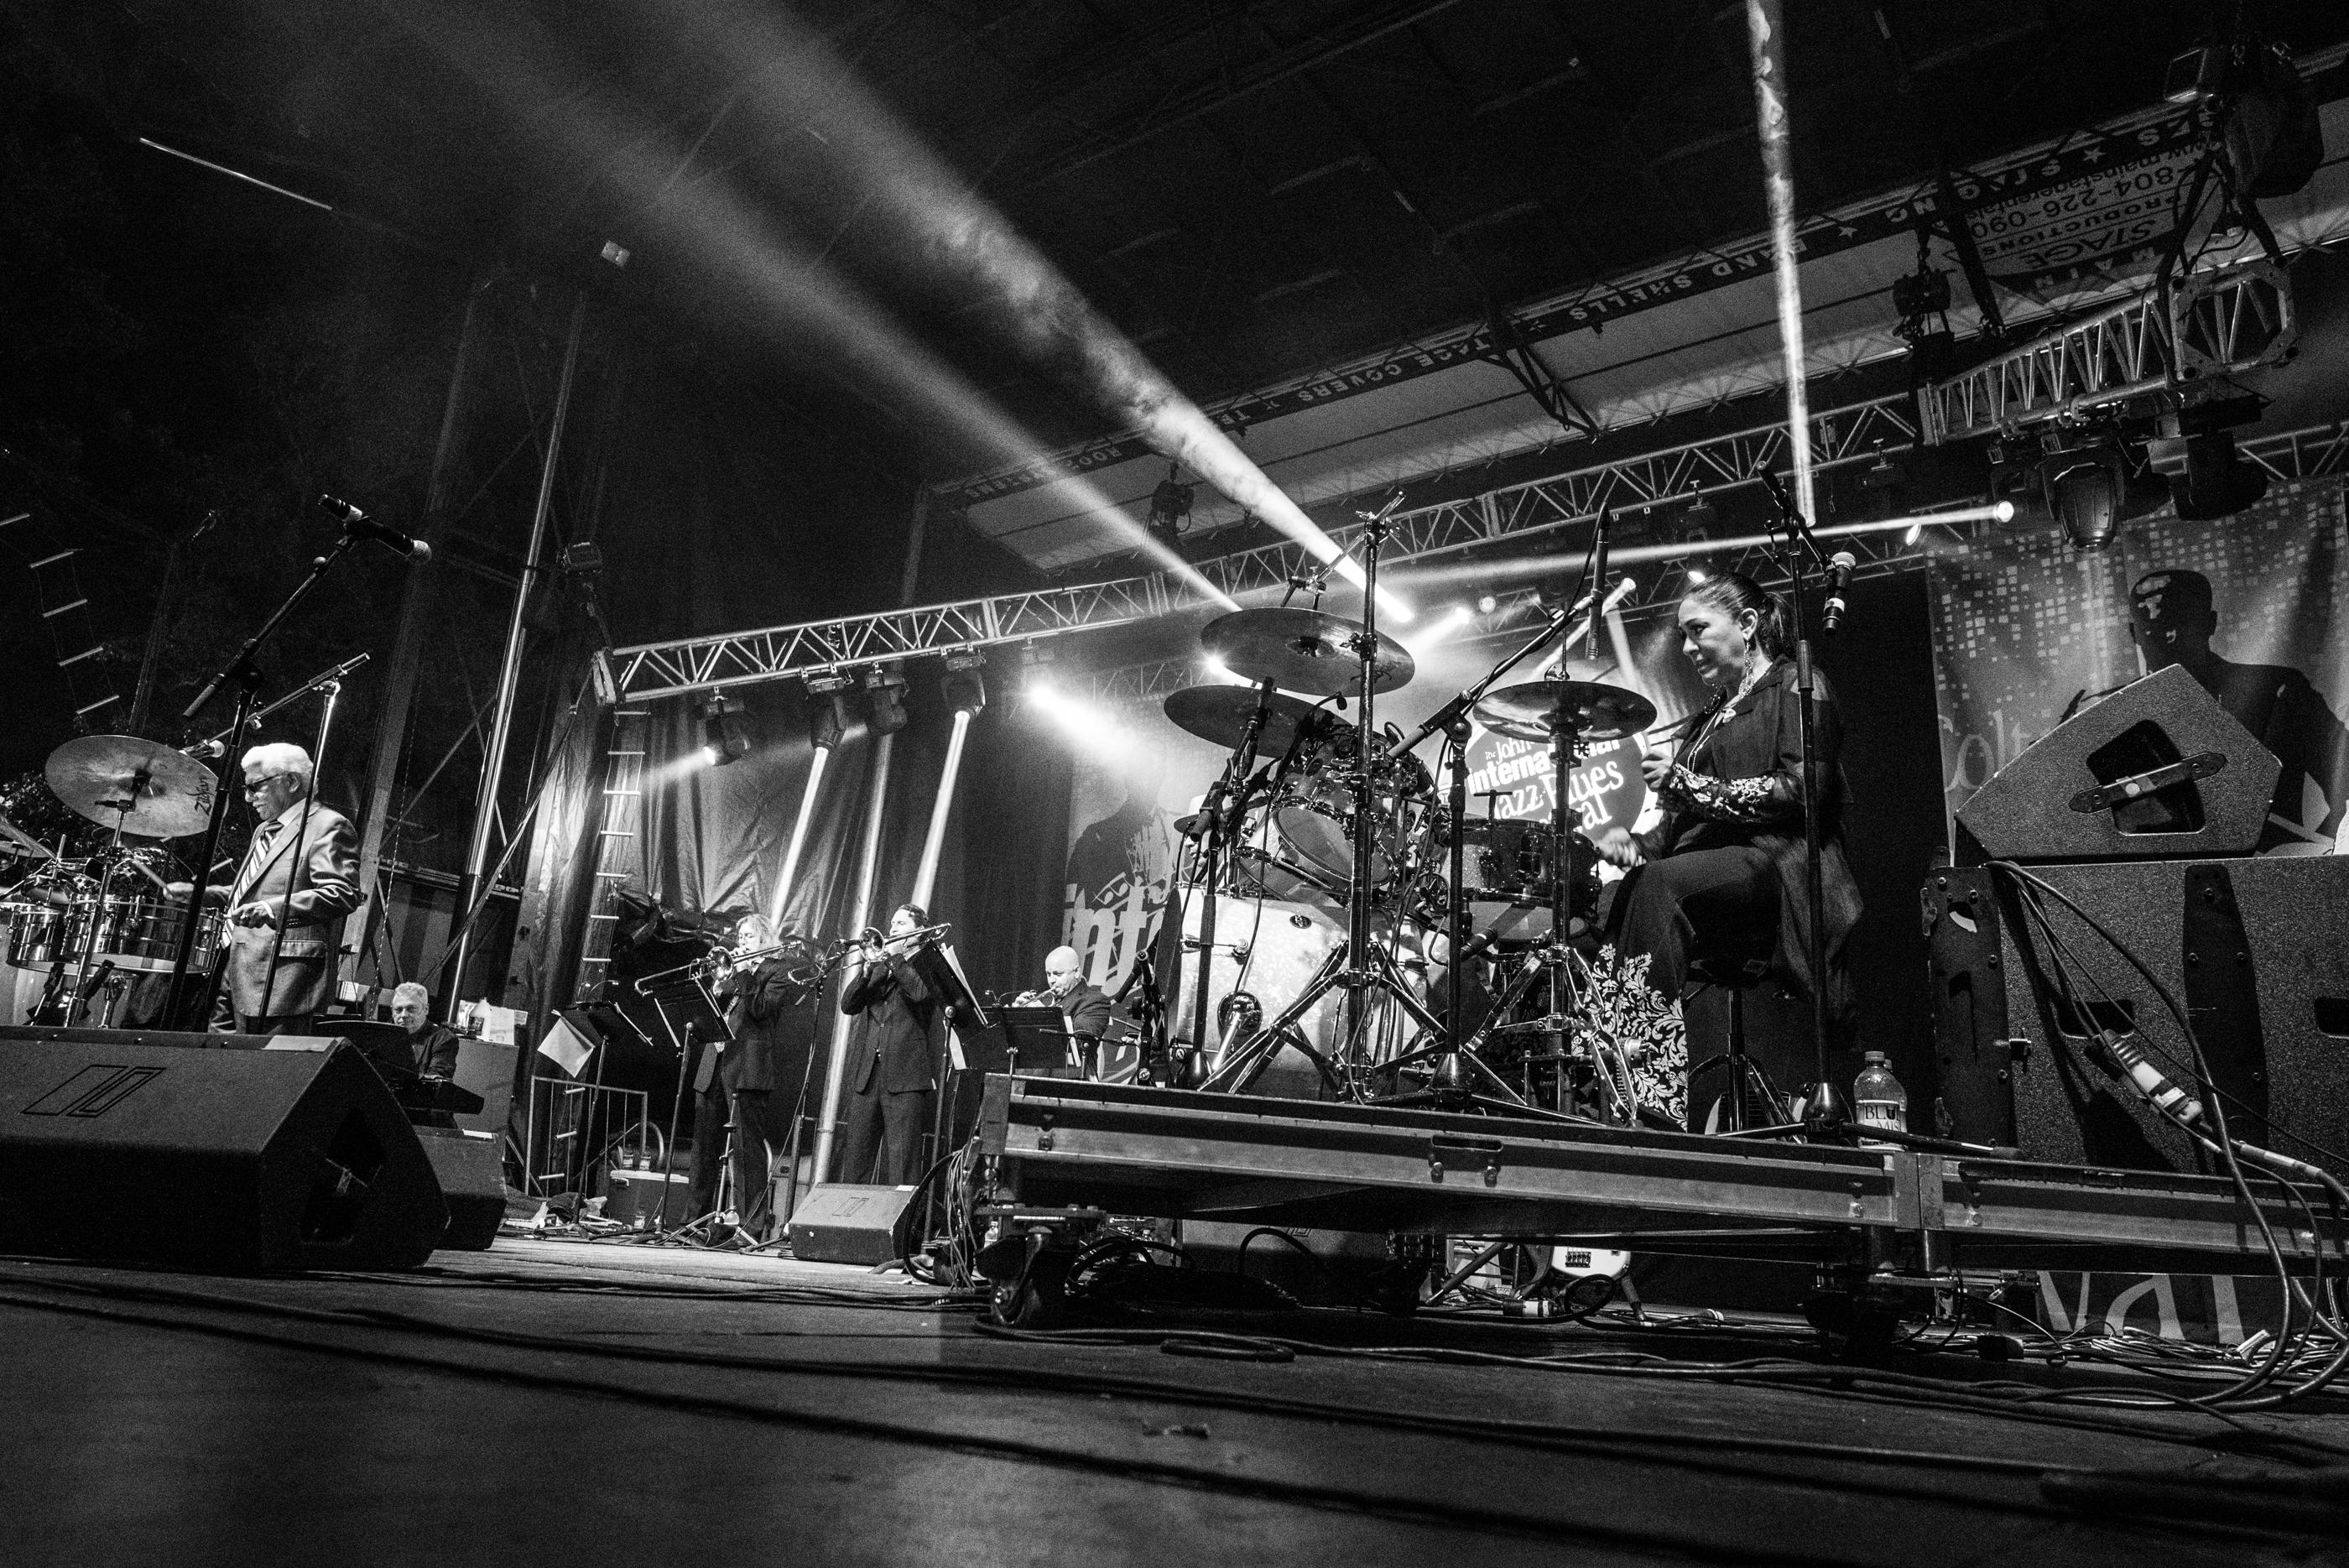 The John Coltrane International Blues and Jazz Festival 2018